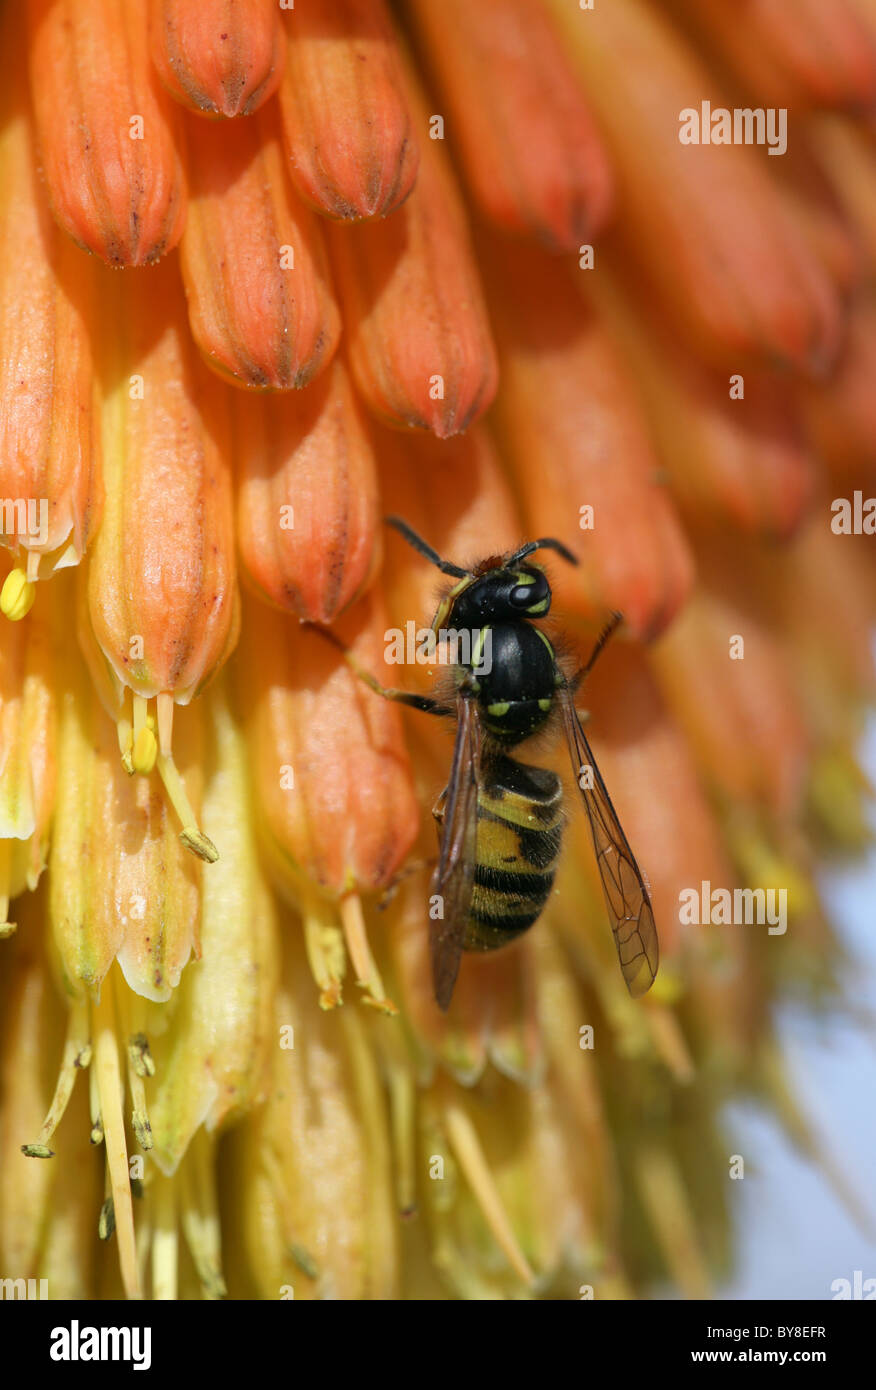 Common wasp Vespula vulgaris Single adult cleaning on red hot poker flower UK - Stock Image